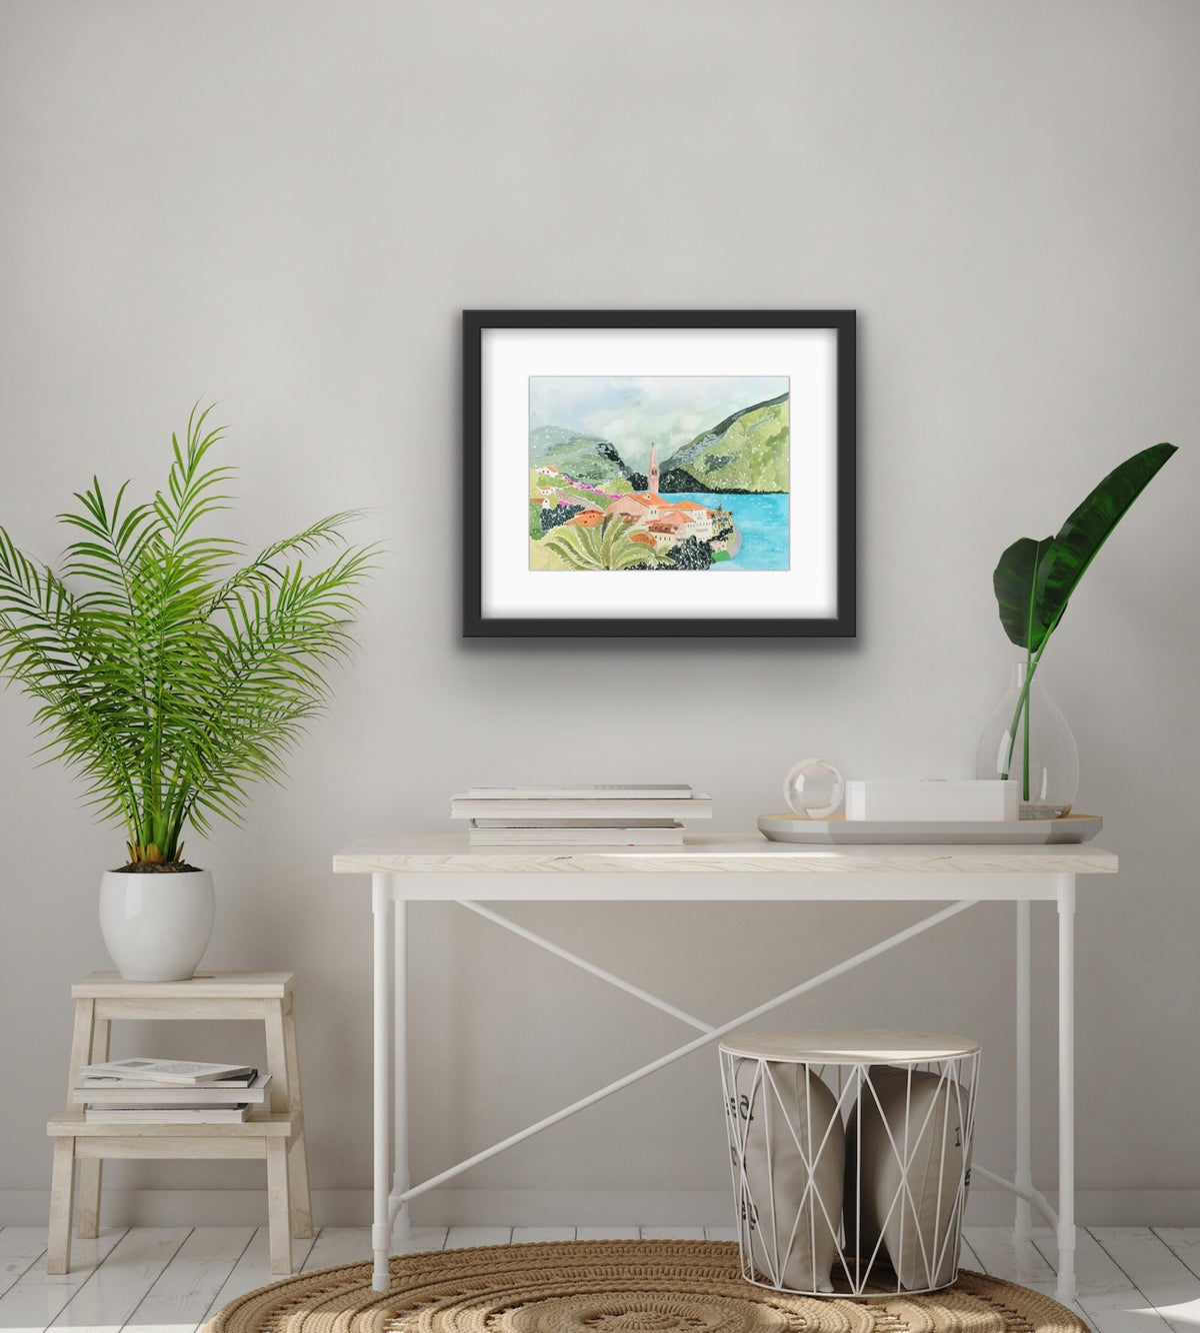 Image of Bay of Kotor